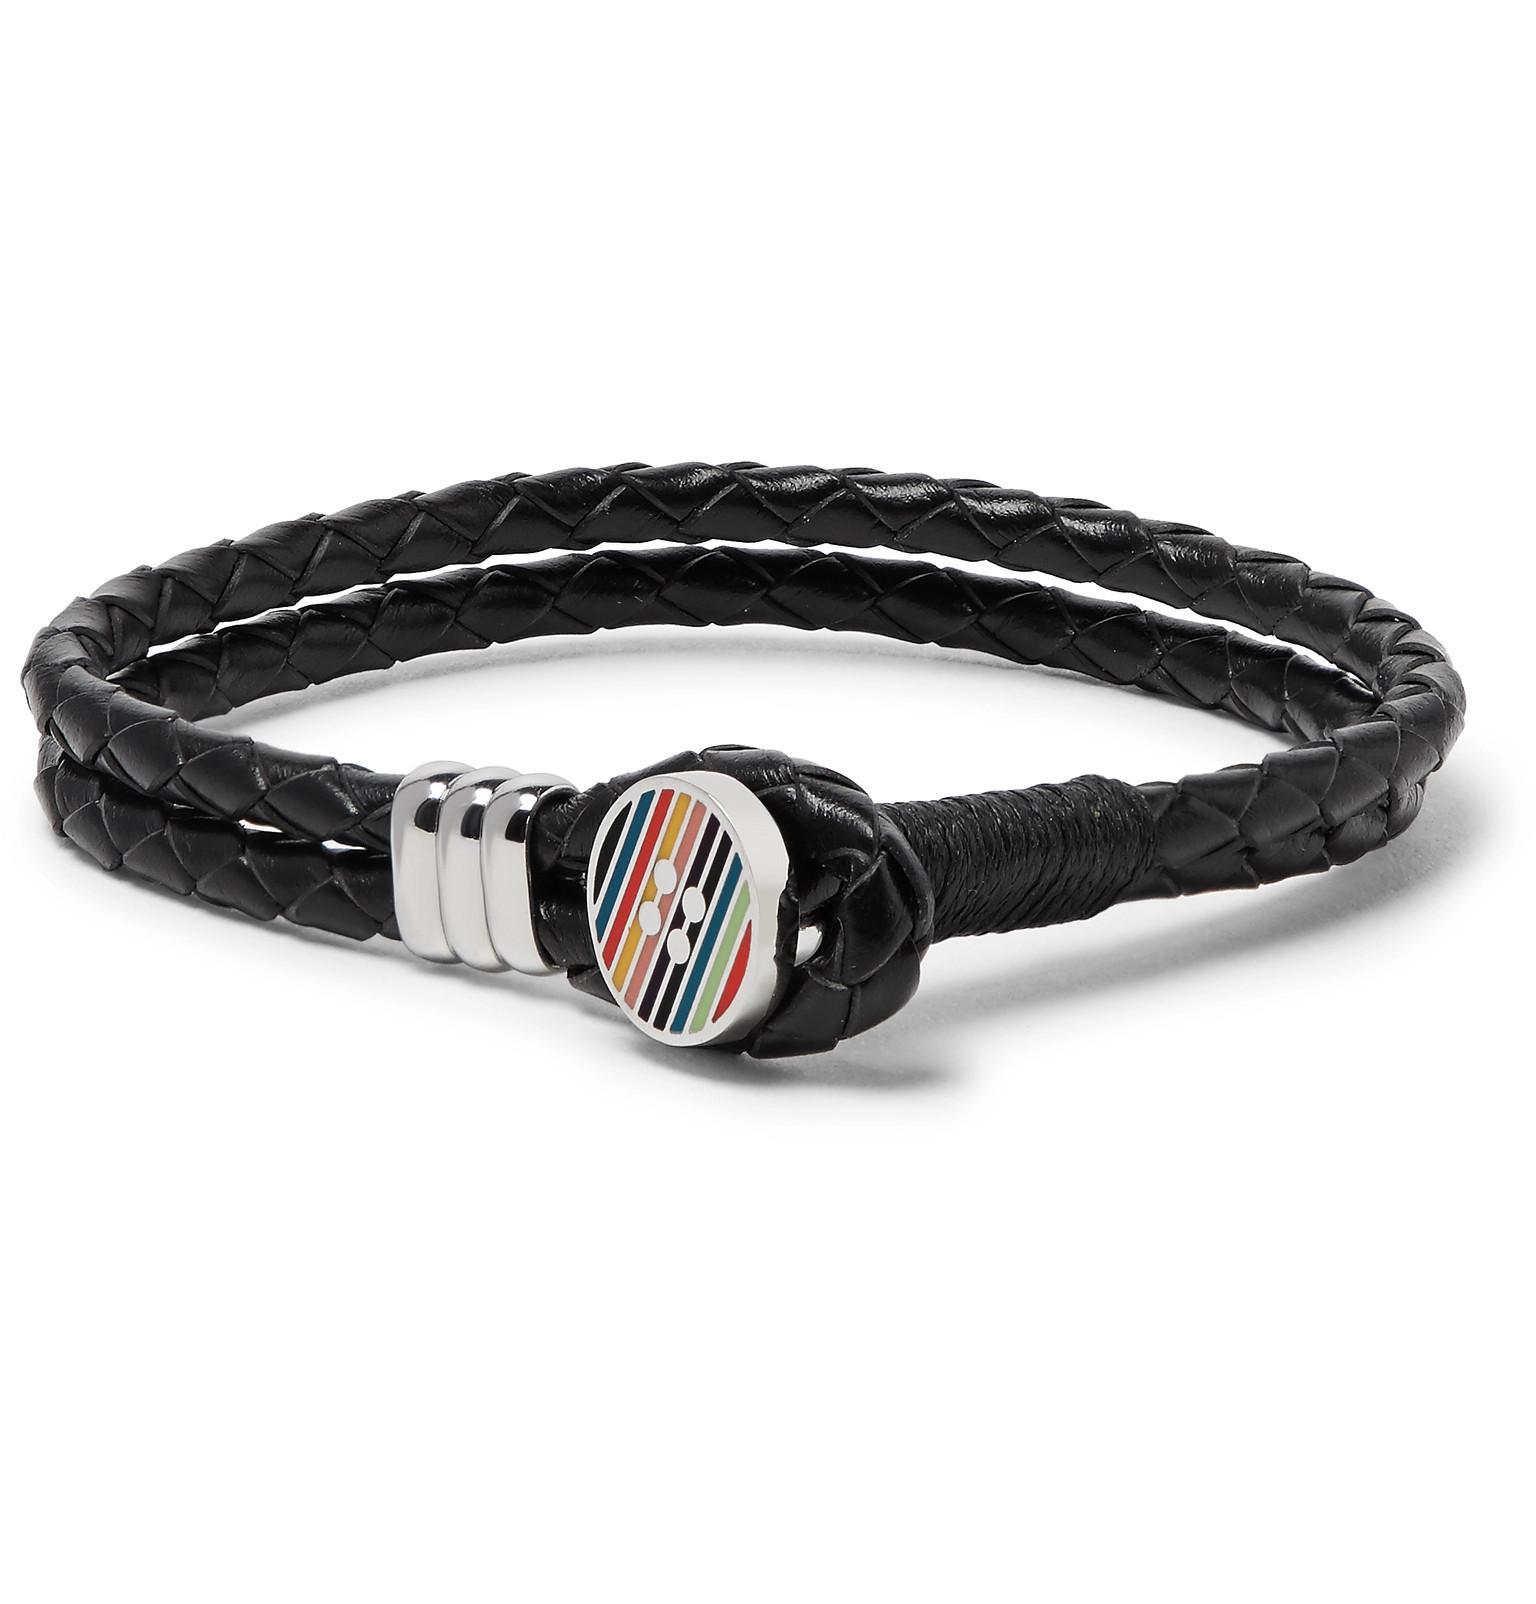 Paul Smith two-tone bracelet - Black uIAGoly